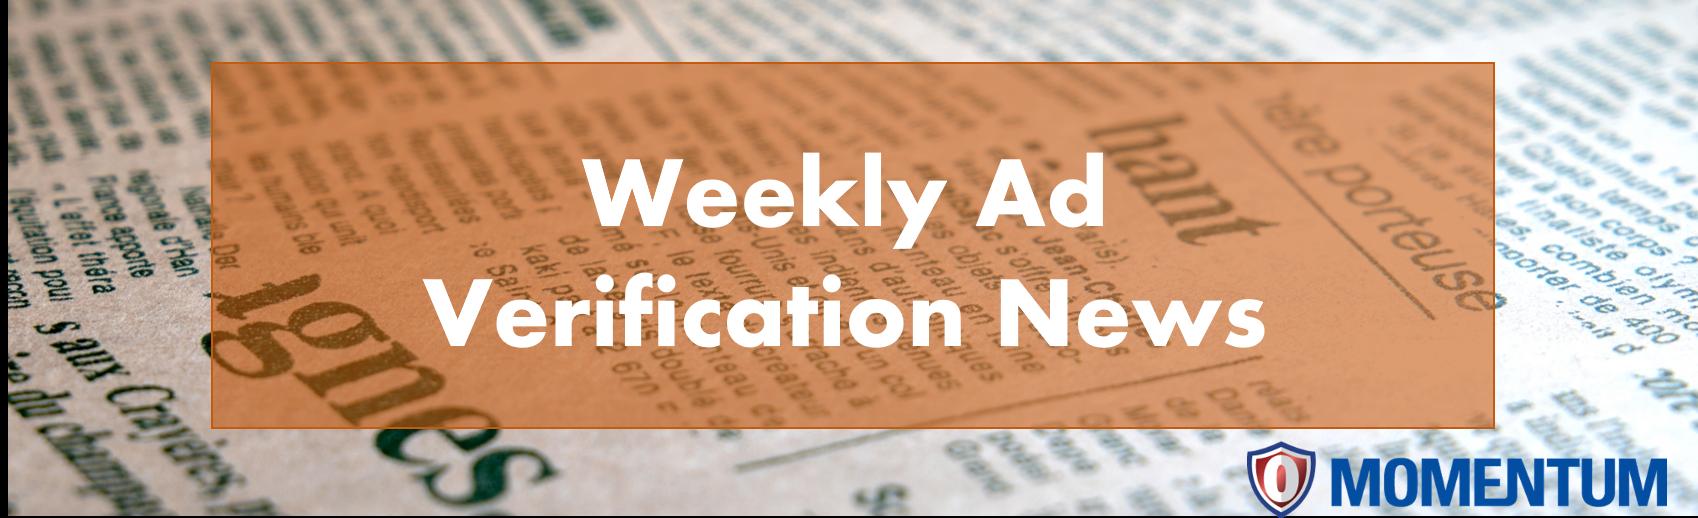 weekly ad verification news-1